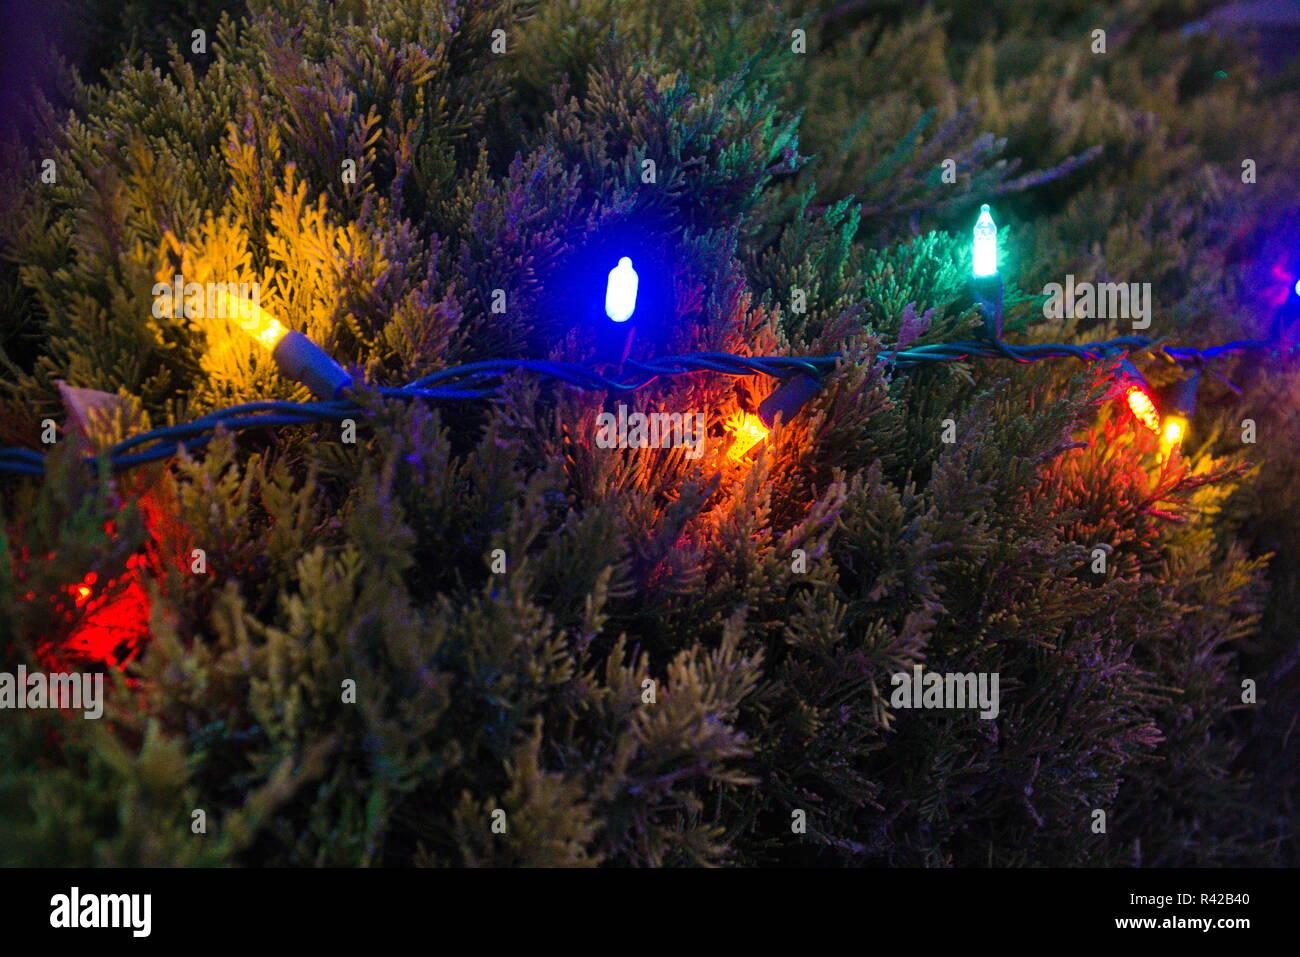 Christmas Bush Lights.Christmas Bush Lights Stock Photos Christmas Bush Lights